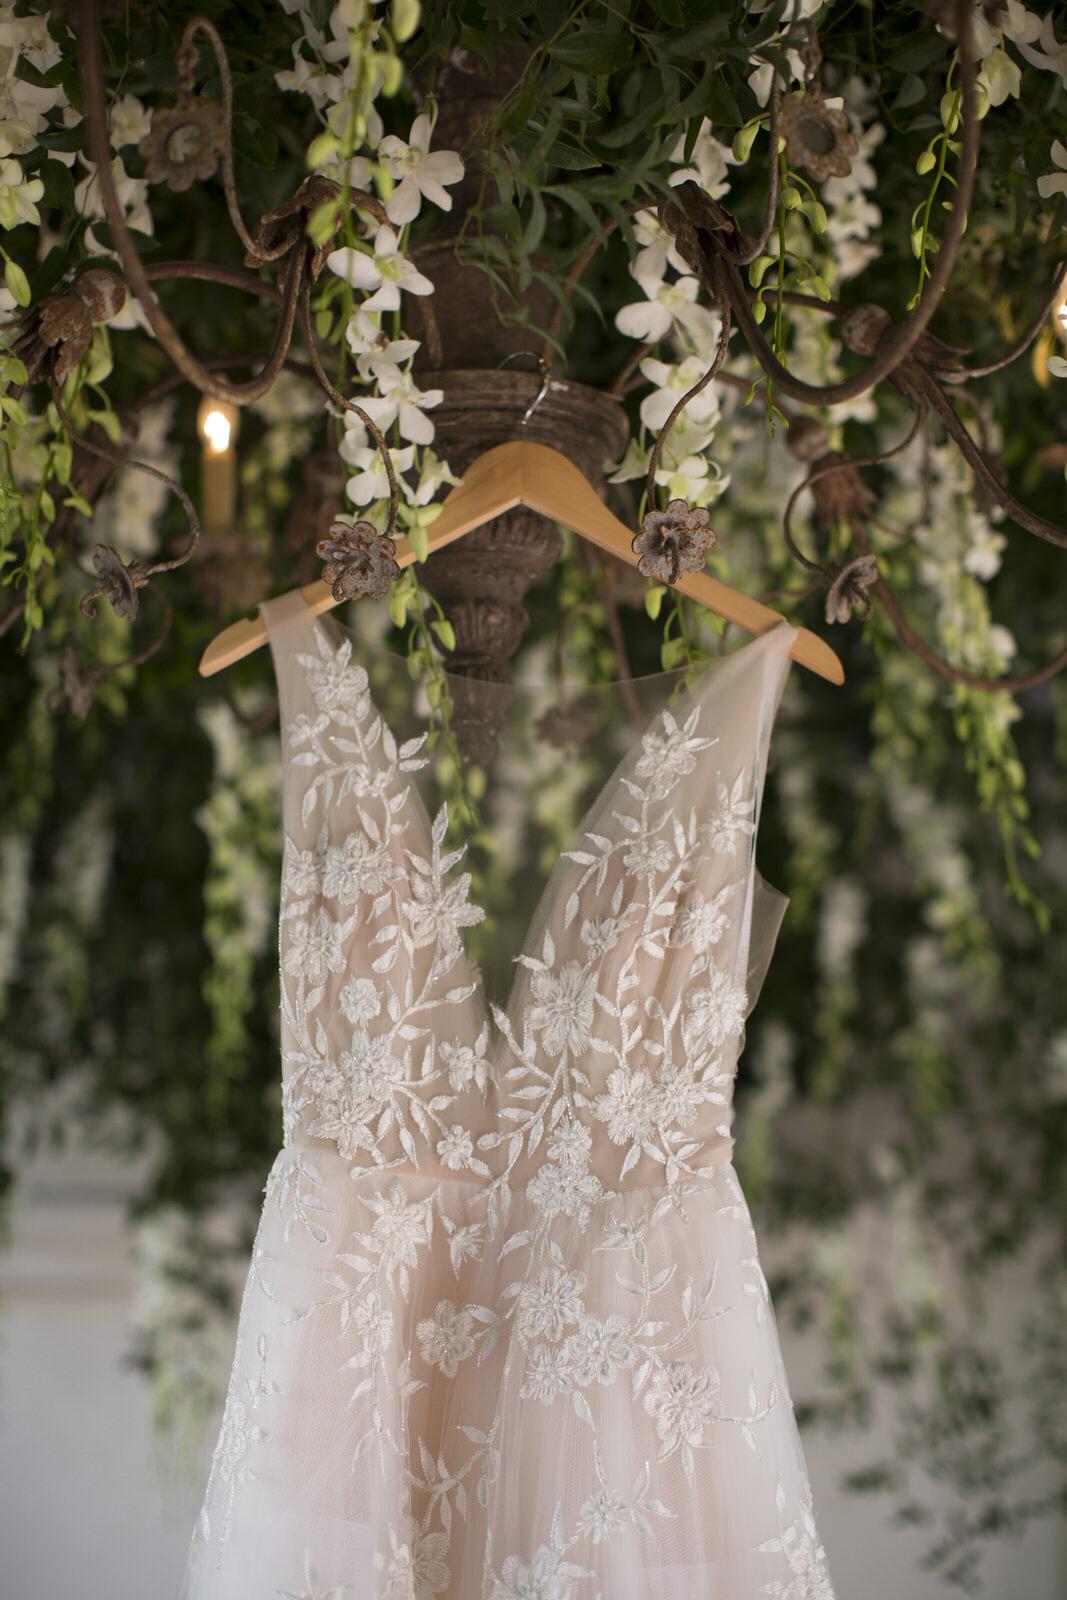 Bride's wedding dress.  Houston, Texas wedding with Jennifer Kaldis of Keely Thorne Events. Maxit Flower Design.